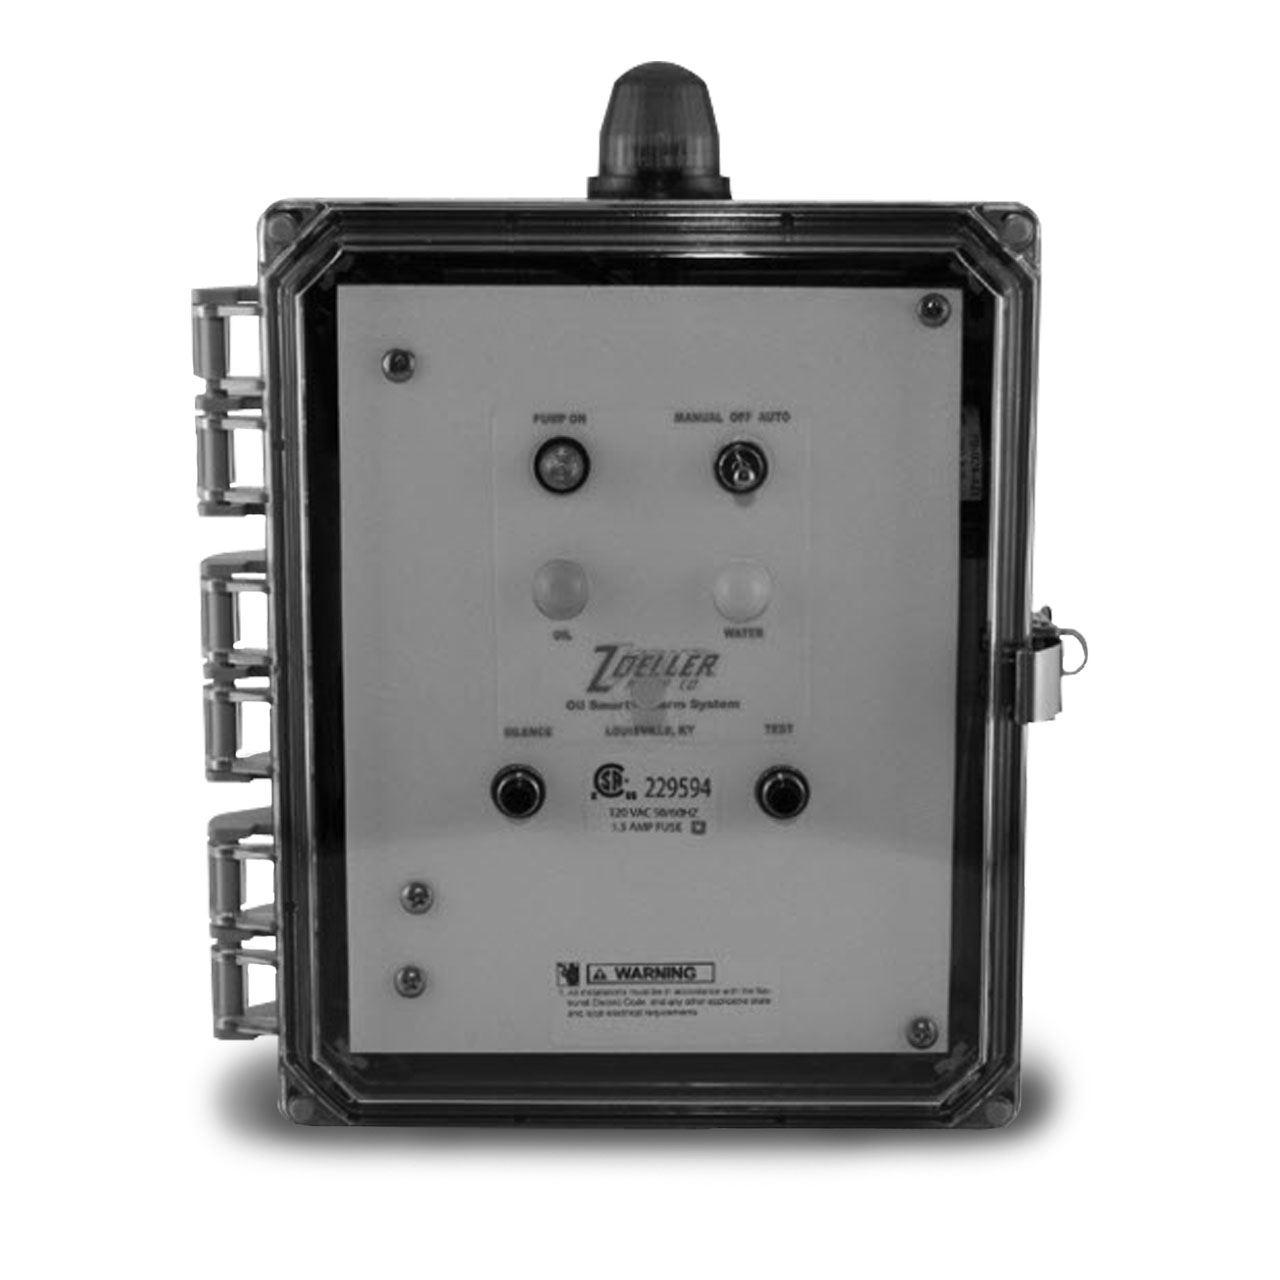 zoeller 10 2149 oil smart simplex control panel 115v 1ph ASSA ABLOY Wiring Diagrams